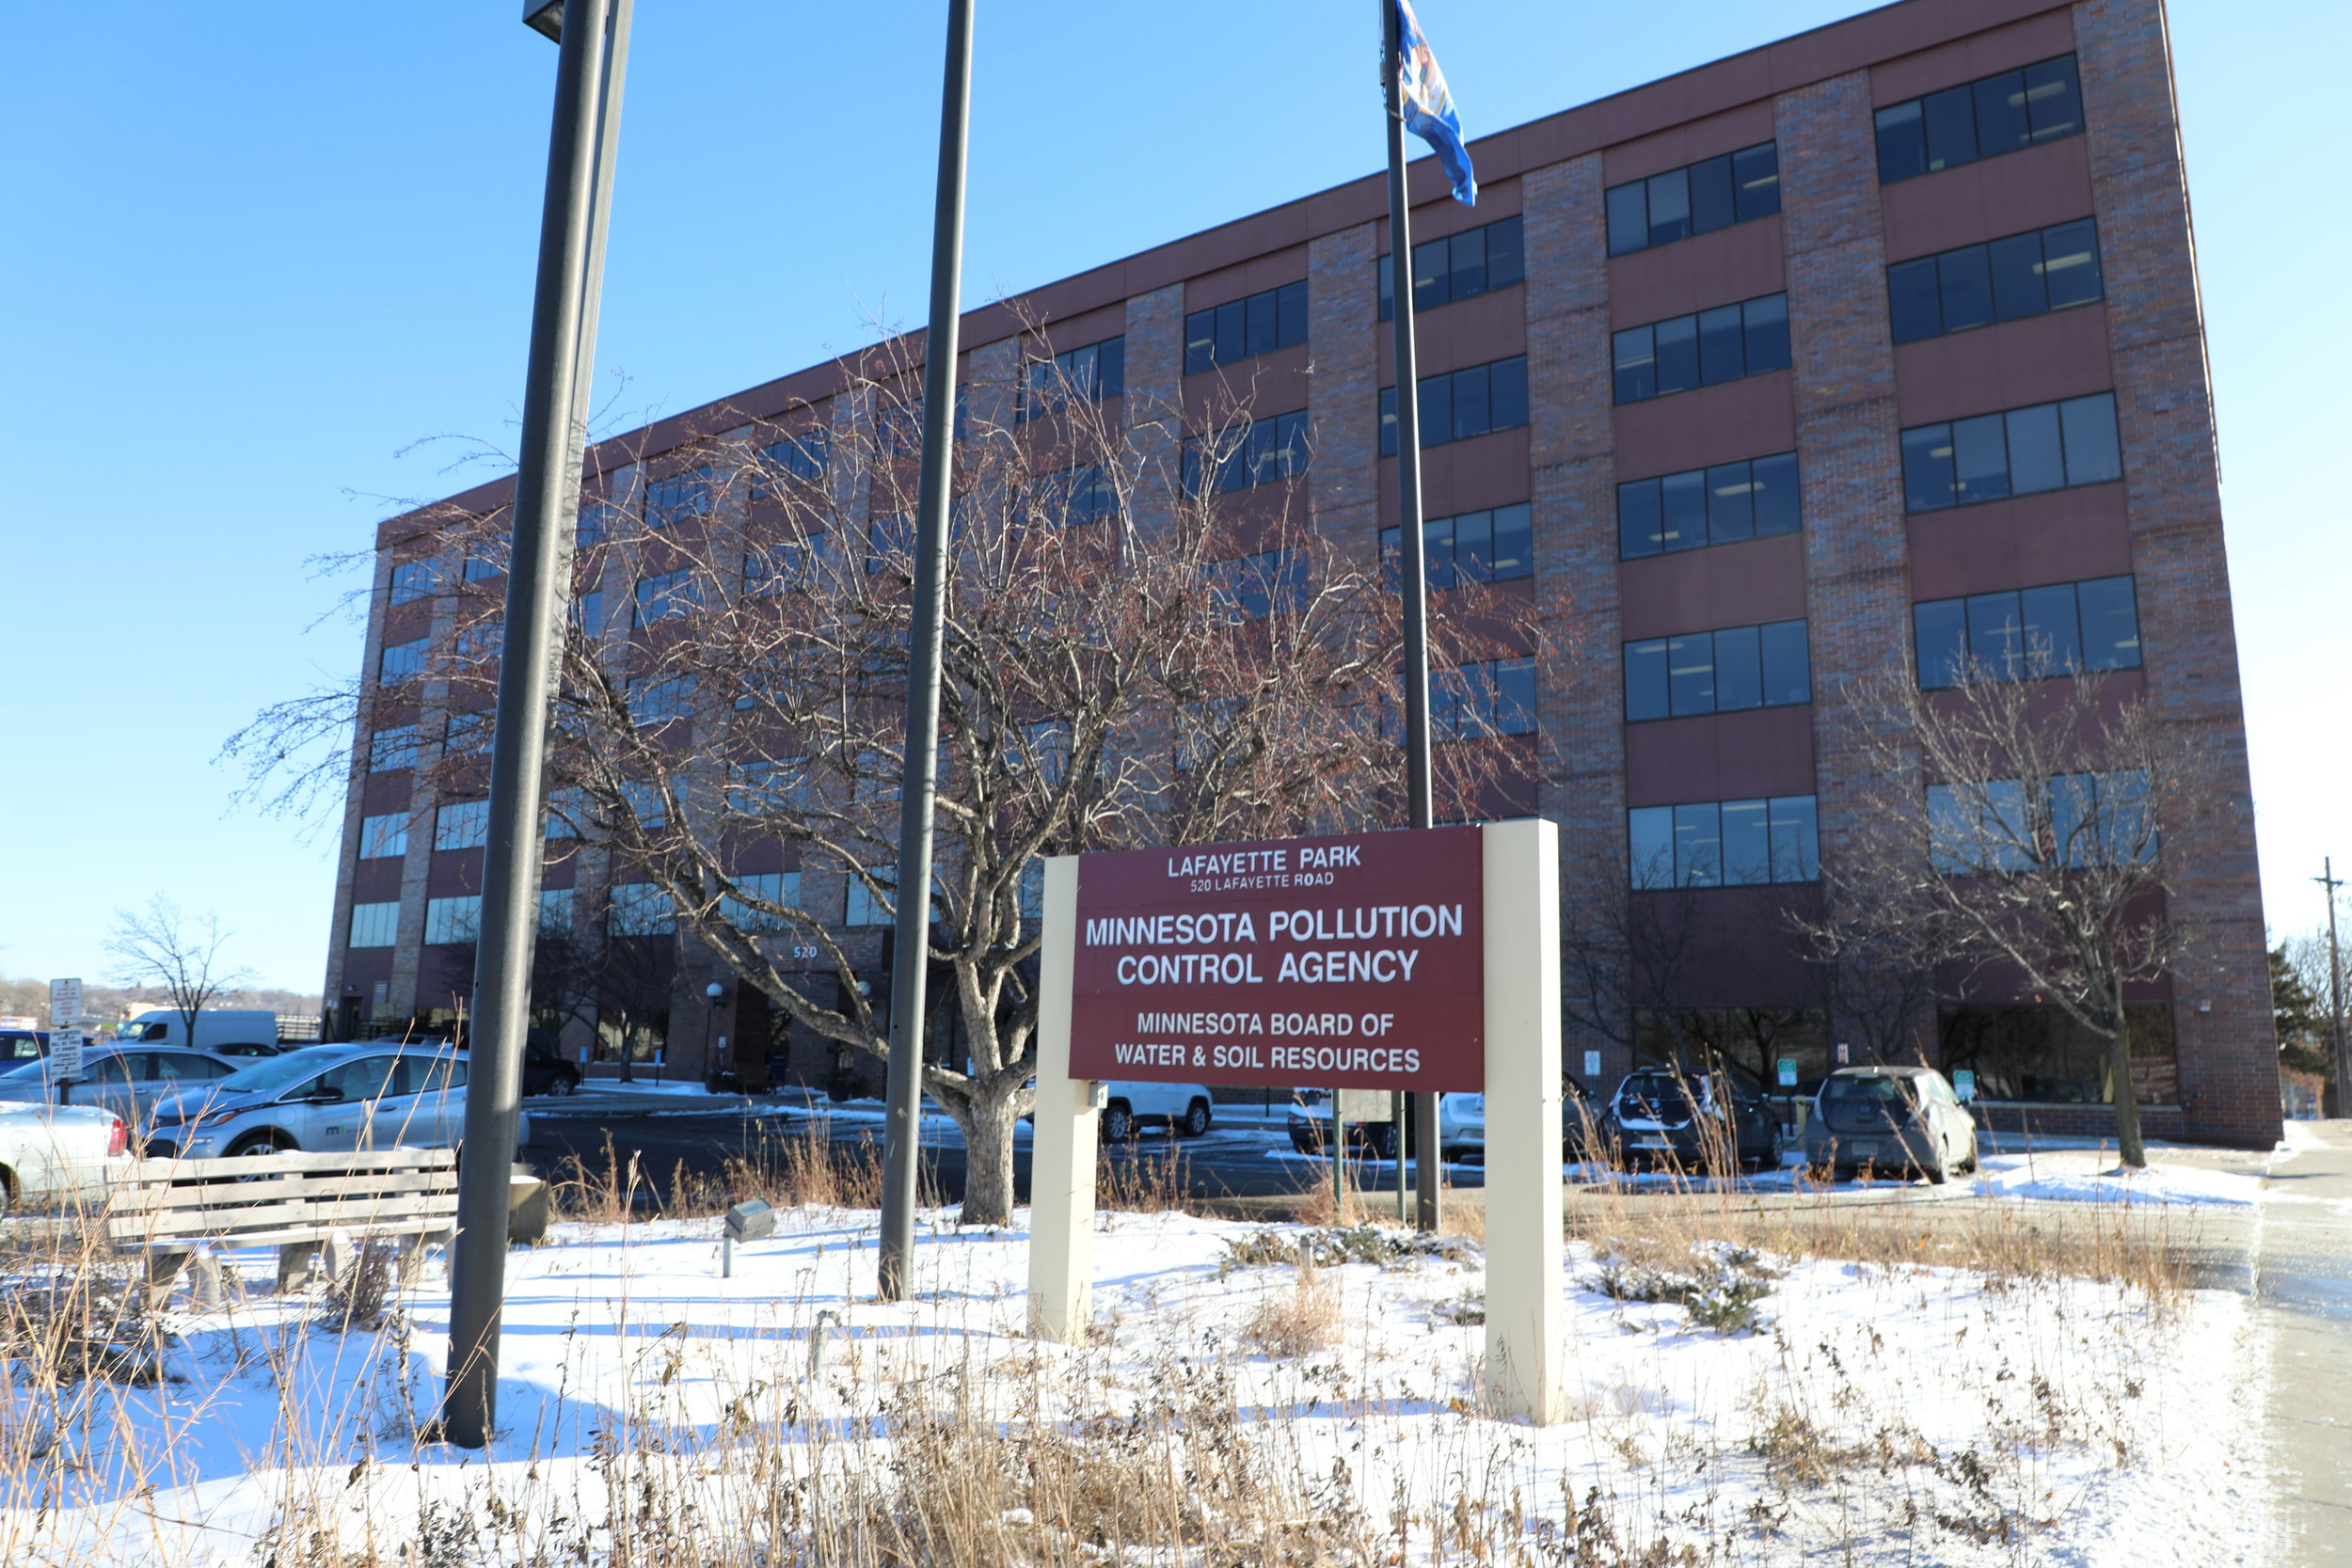 Minnesota Polution Control Agency